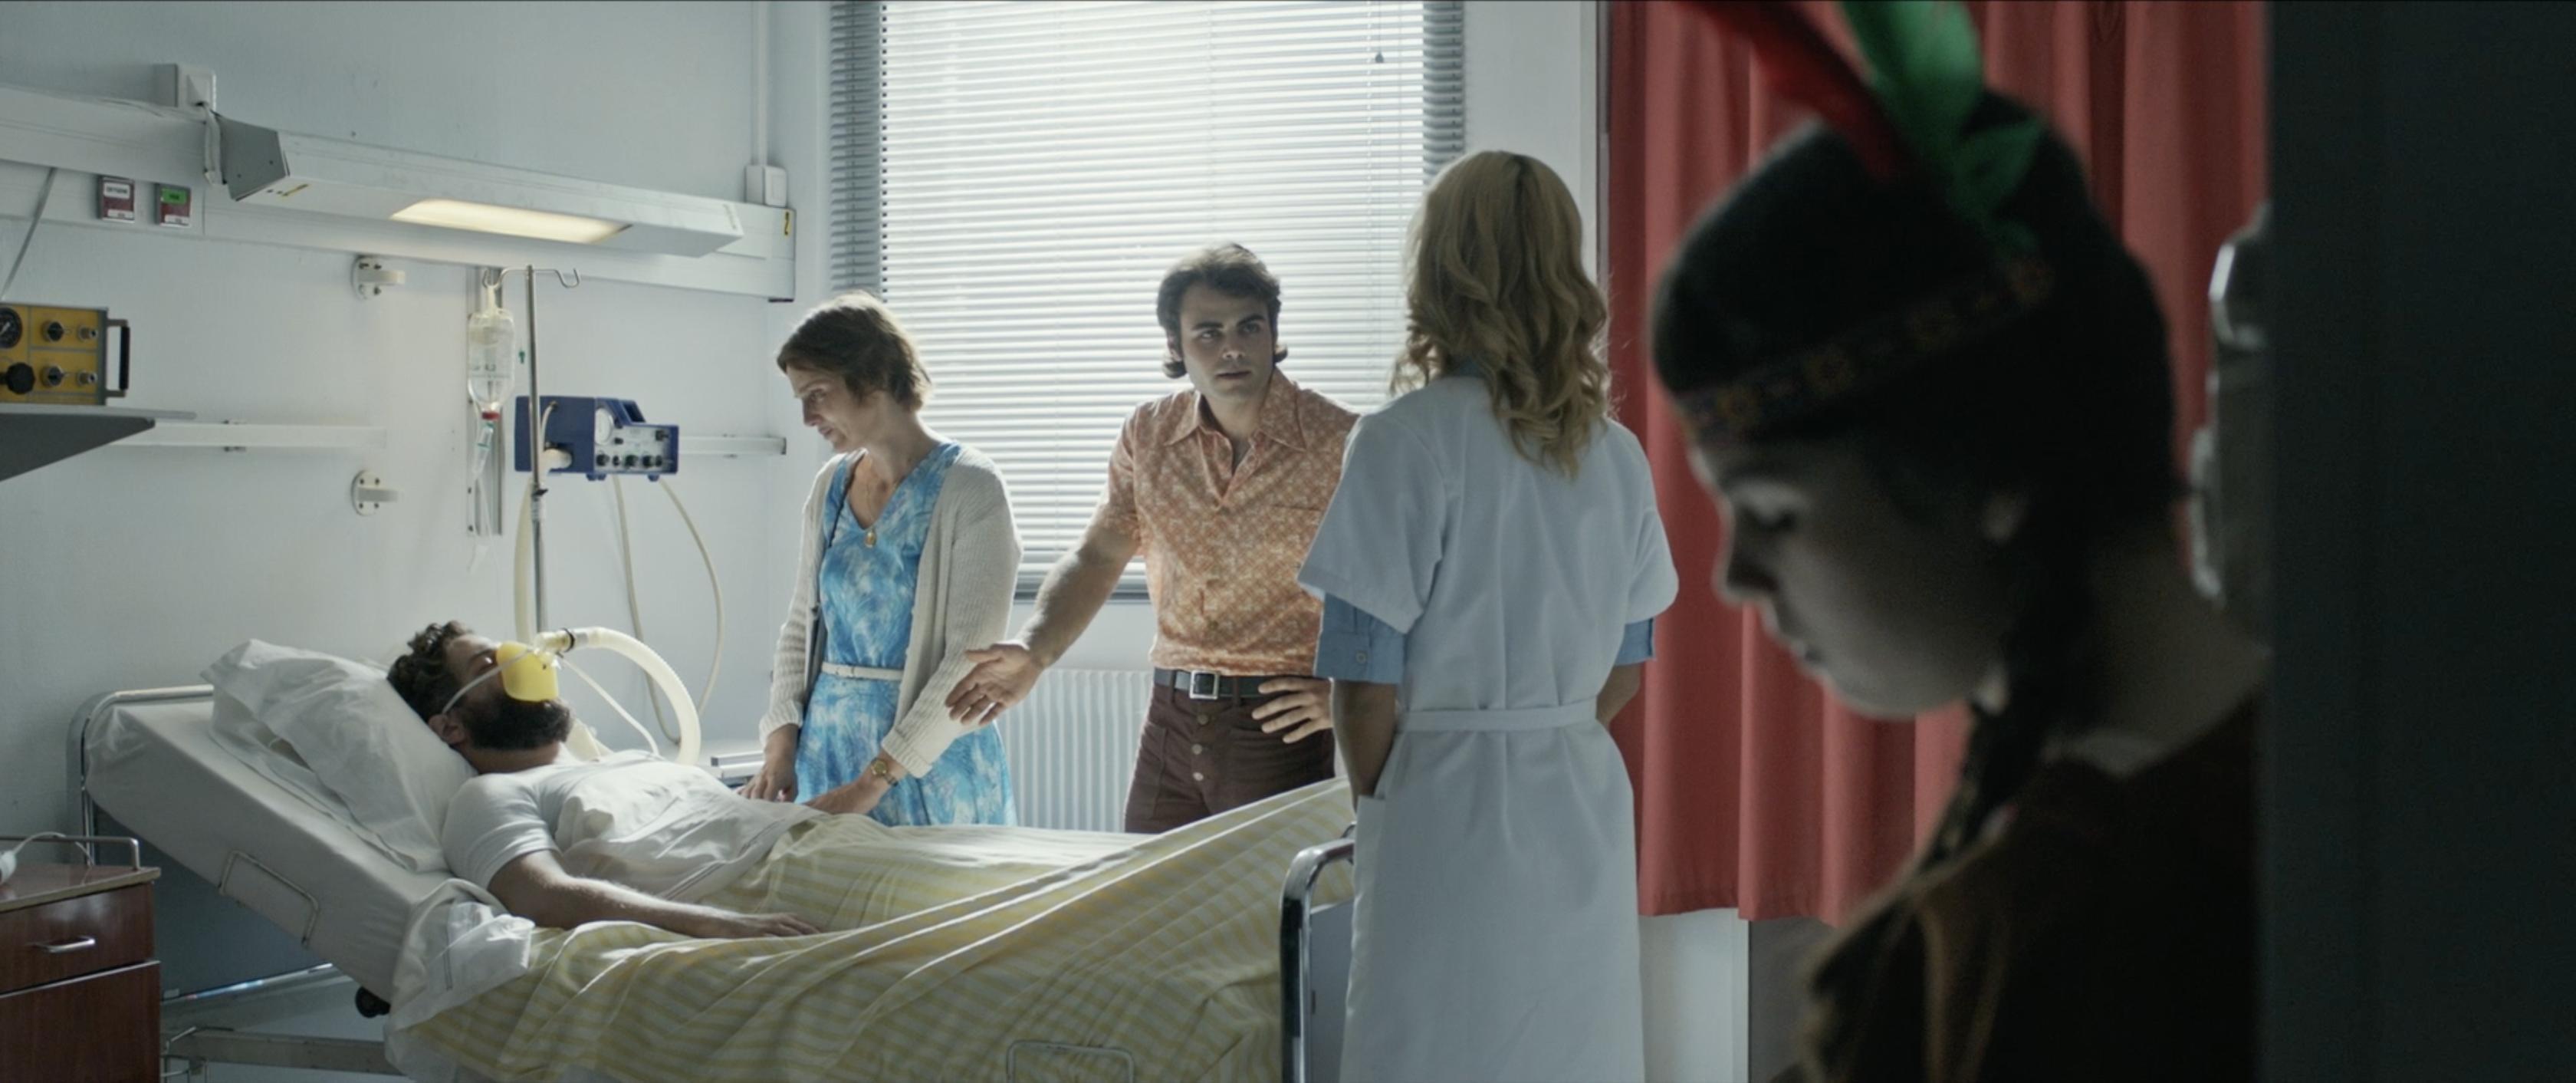 Beatriz Batarda, Nuno Lopes, Thomas Brazete, and Naomi Biton in Menina (2017)